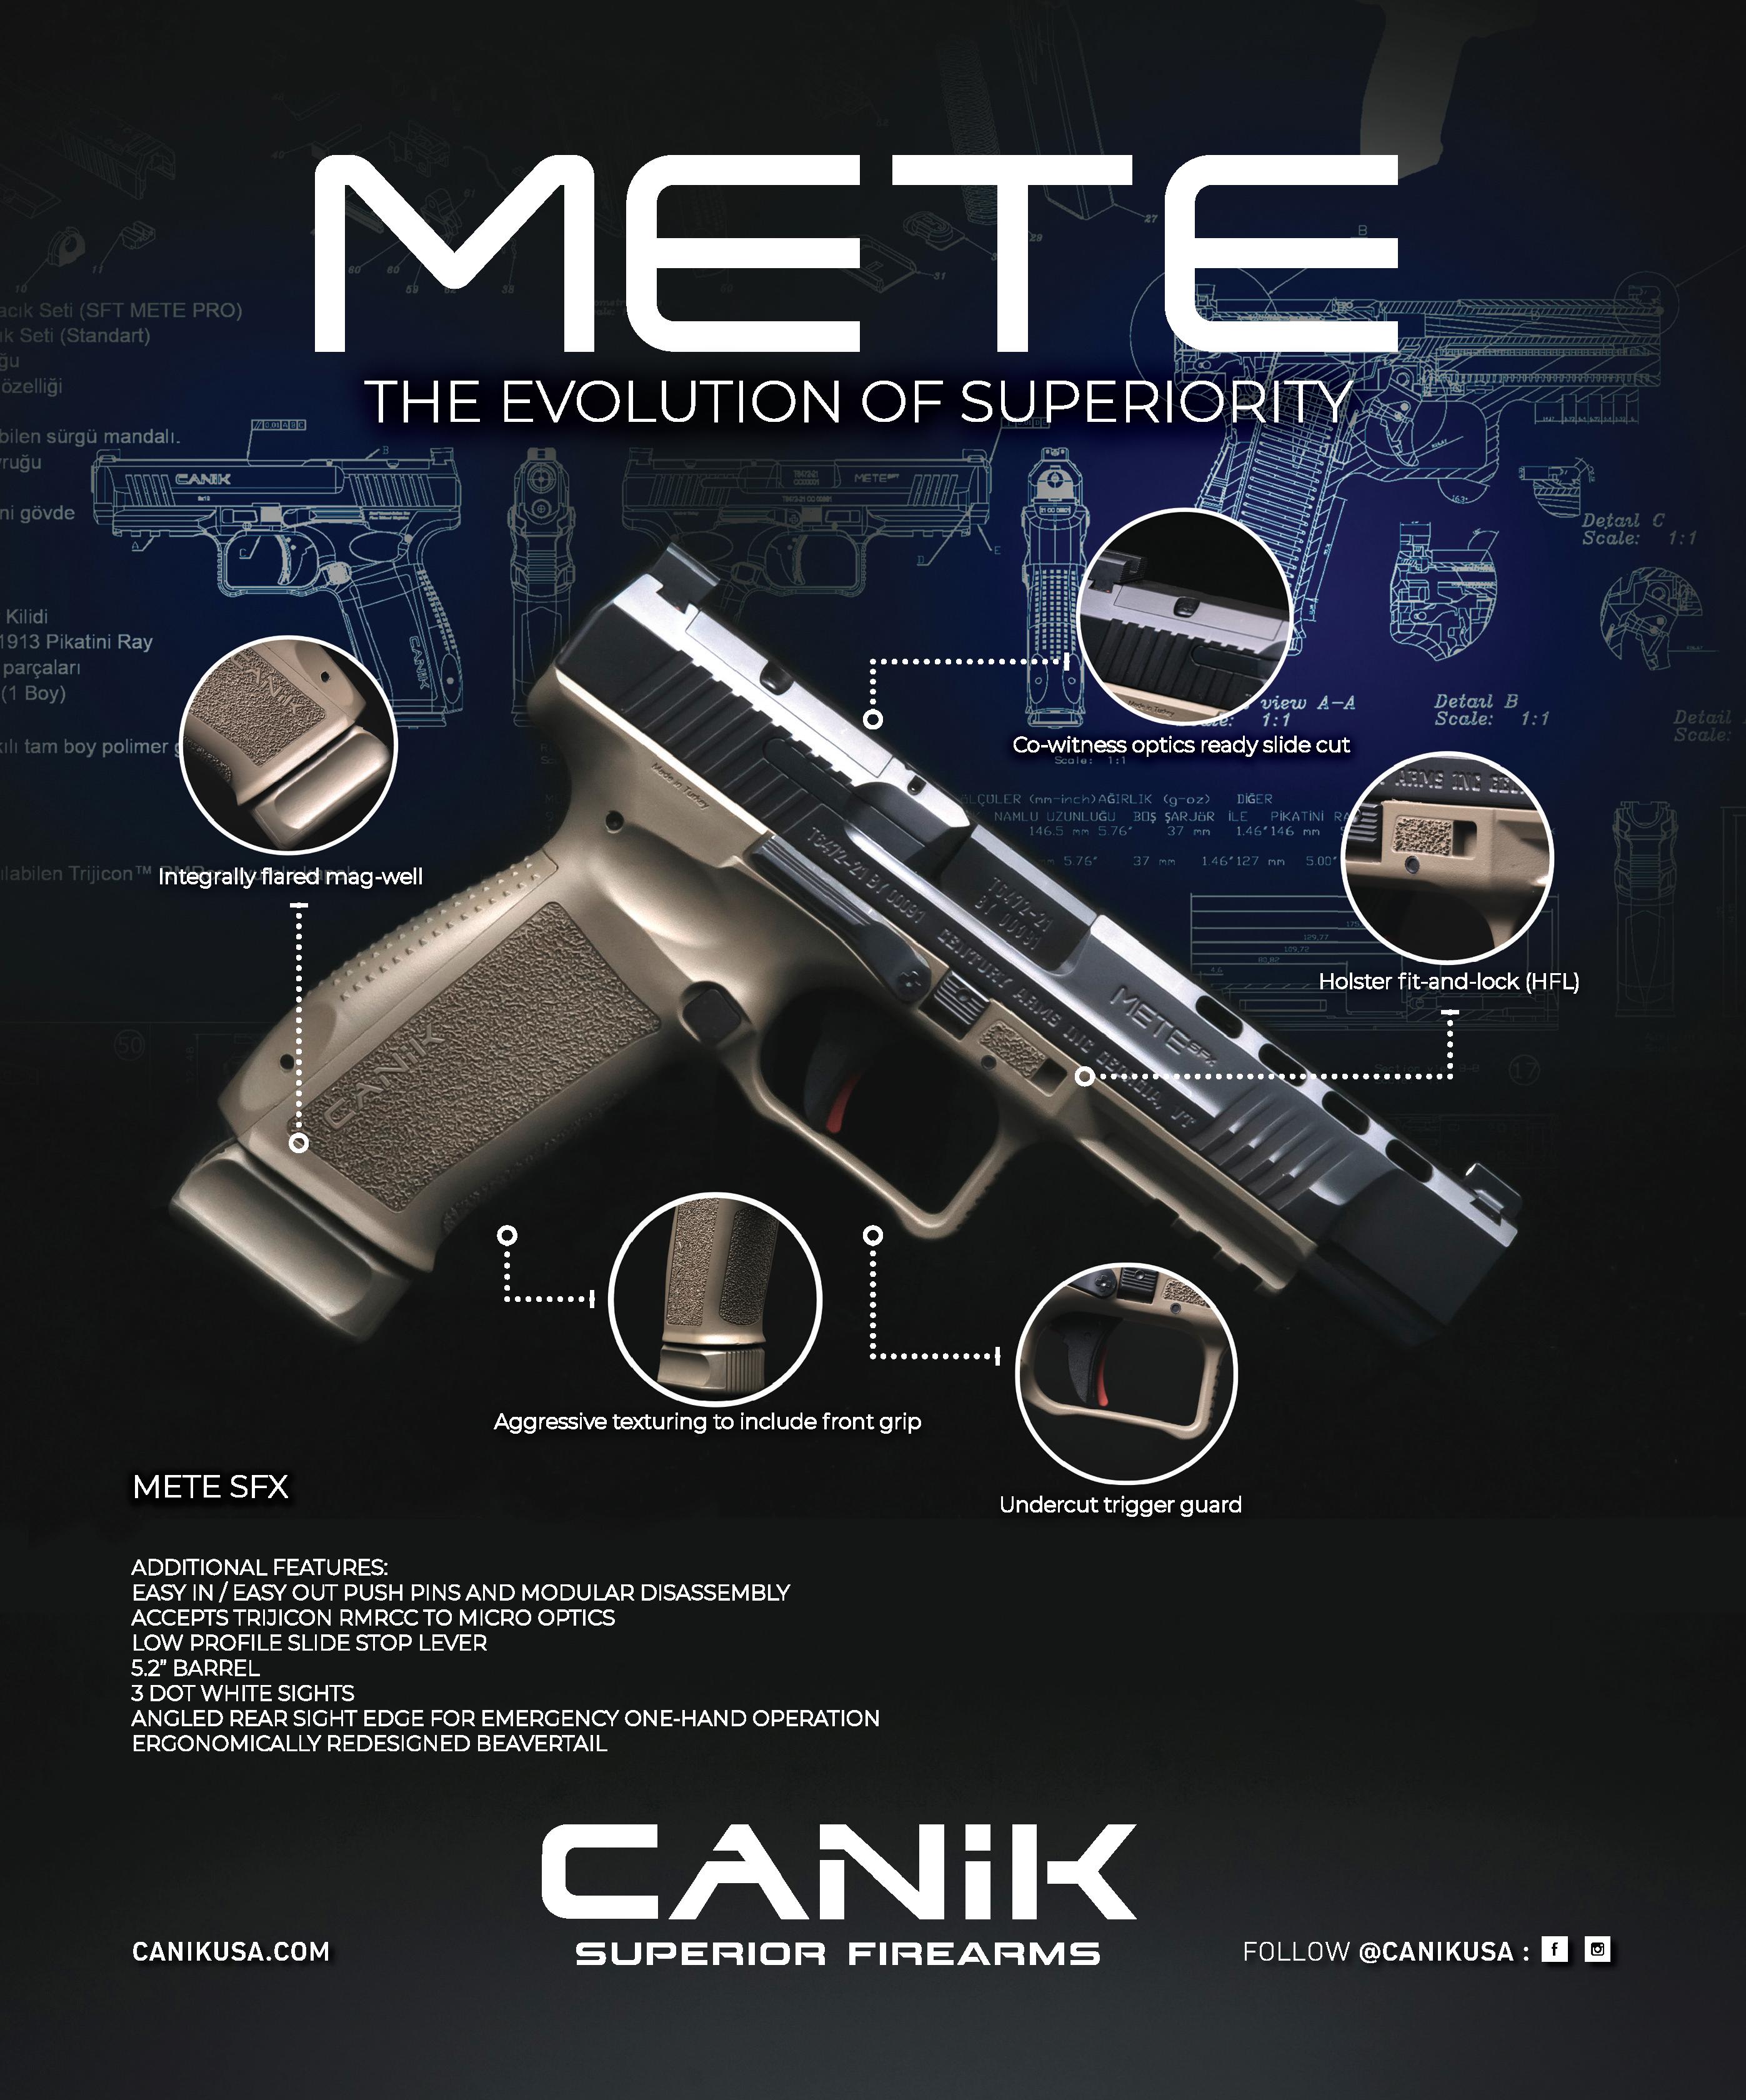 NEW Canik METE Series Announcement